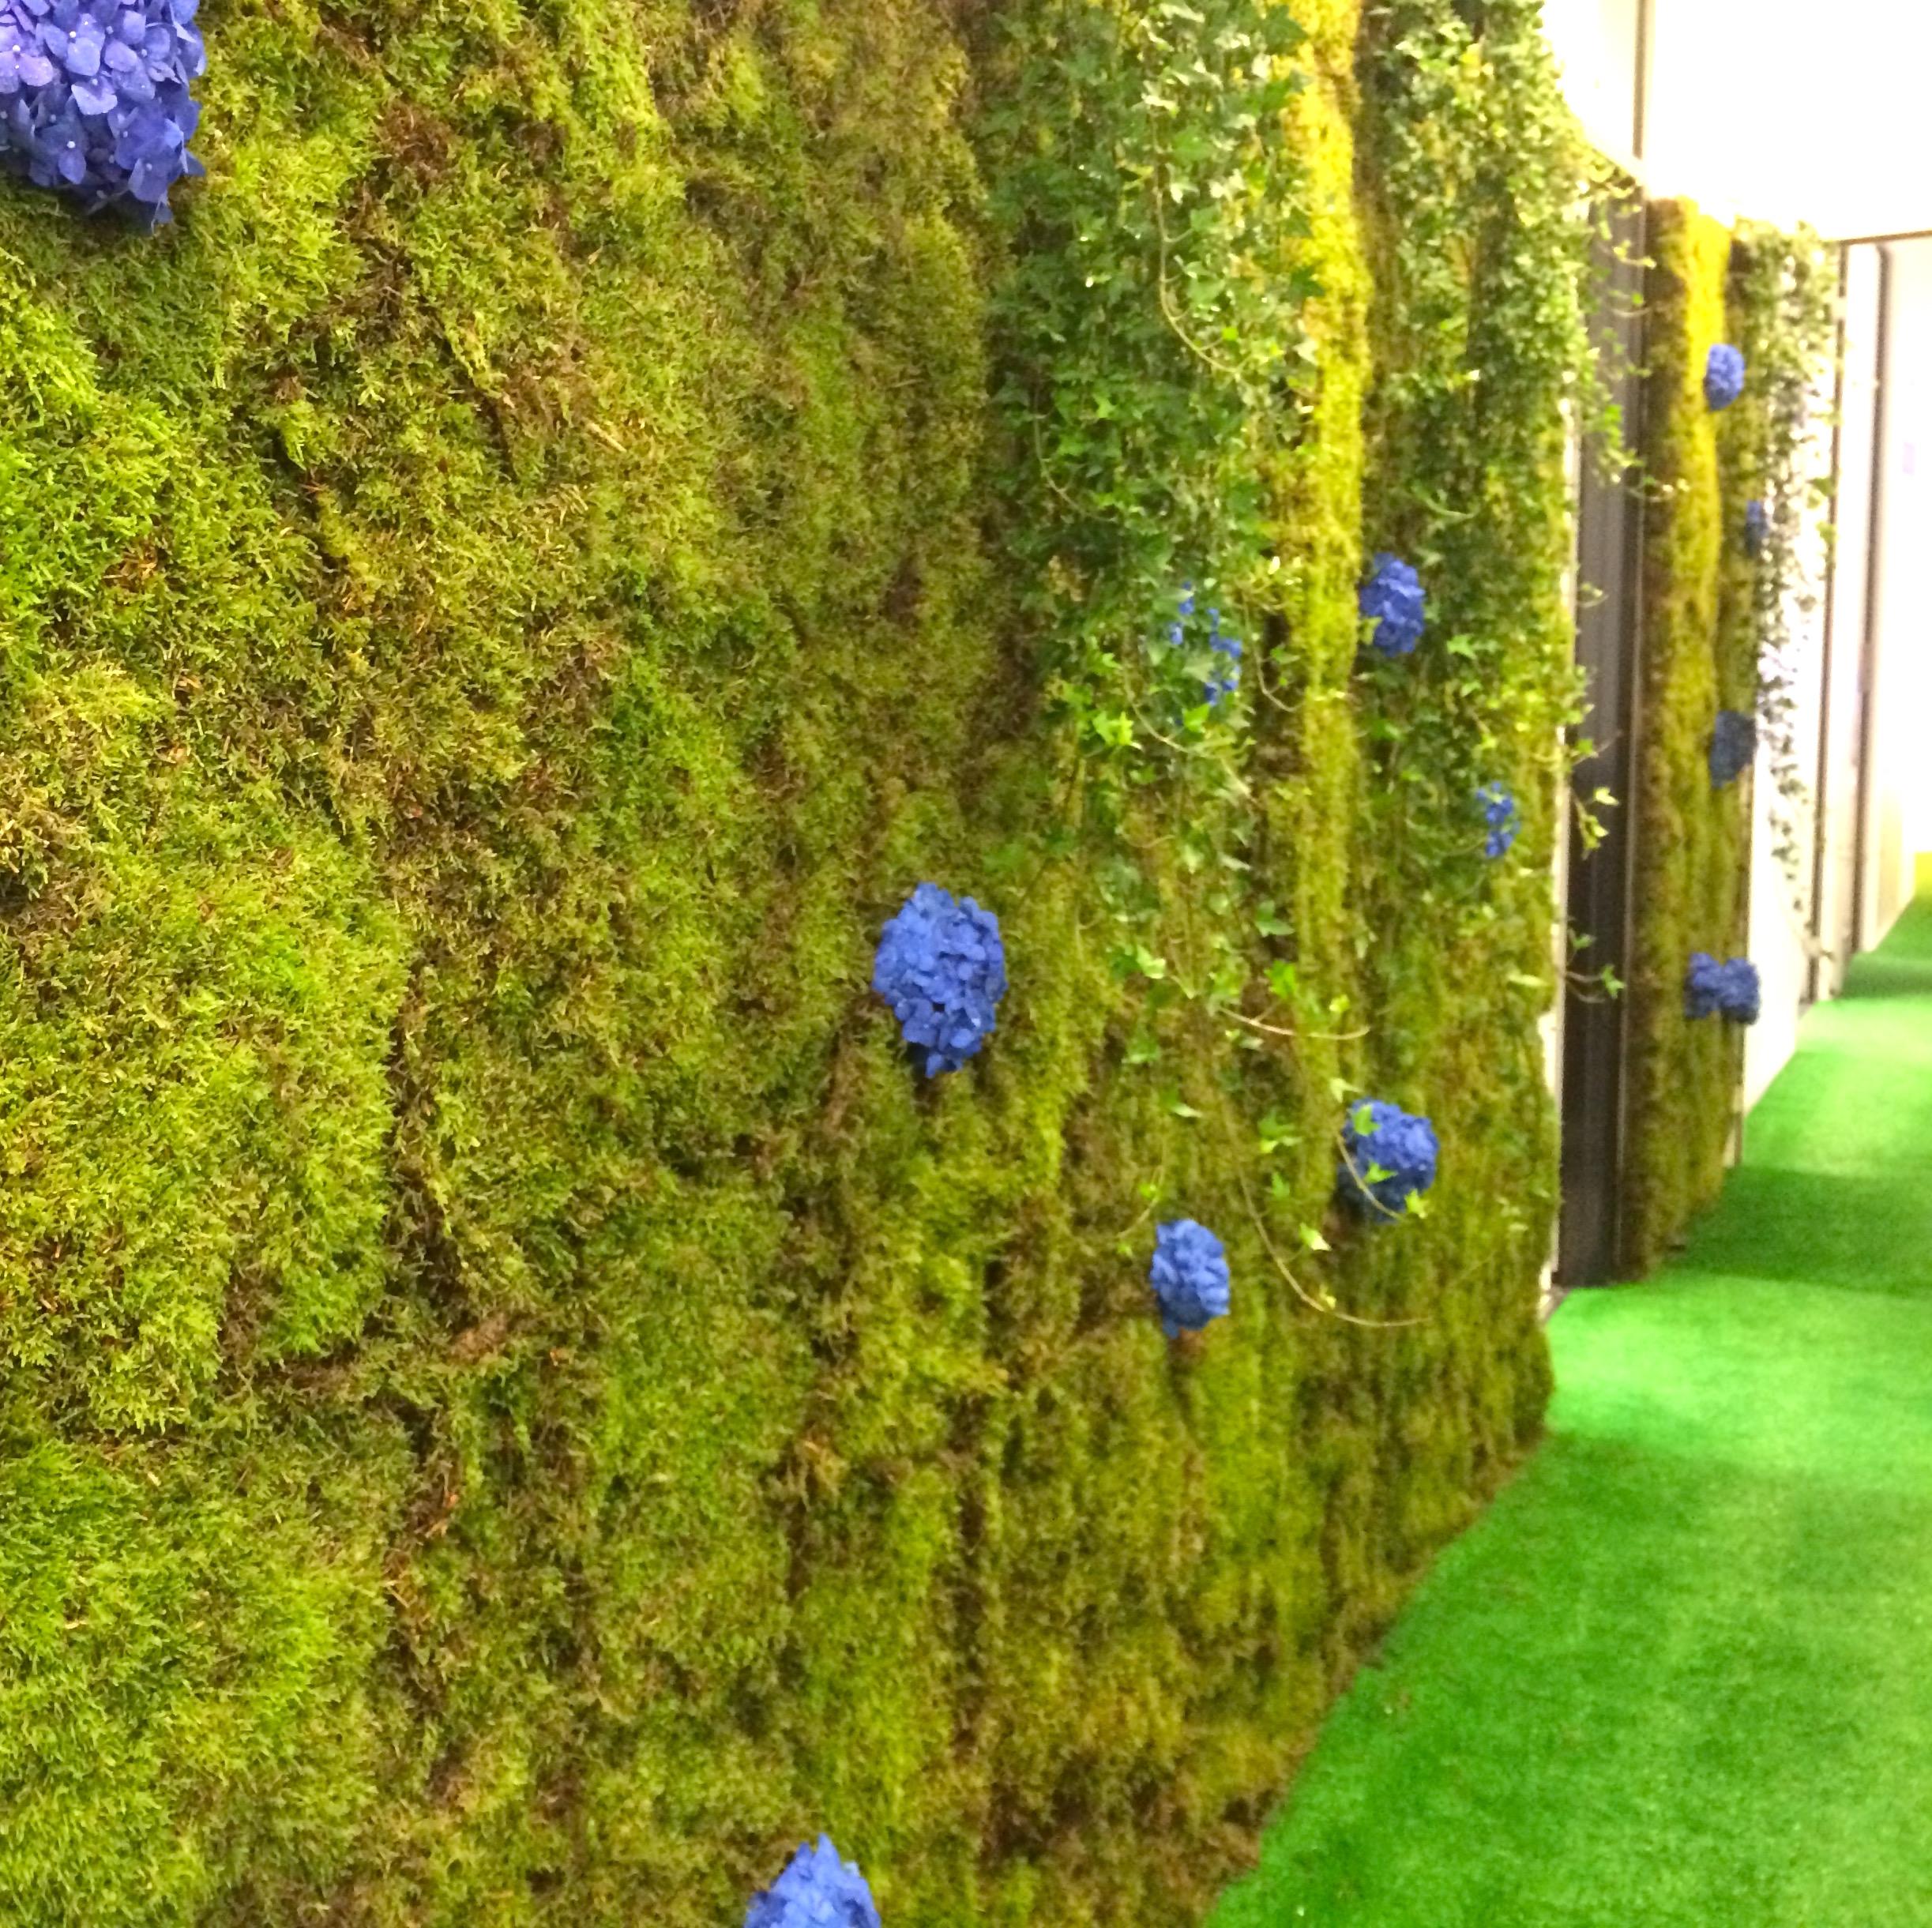 Christian Morel Fleuriste Paris - Evenement mur vegetal